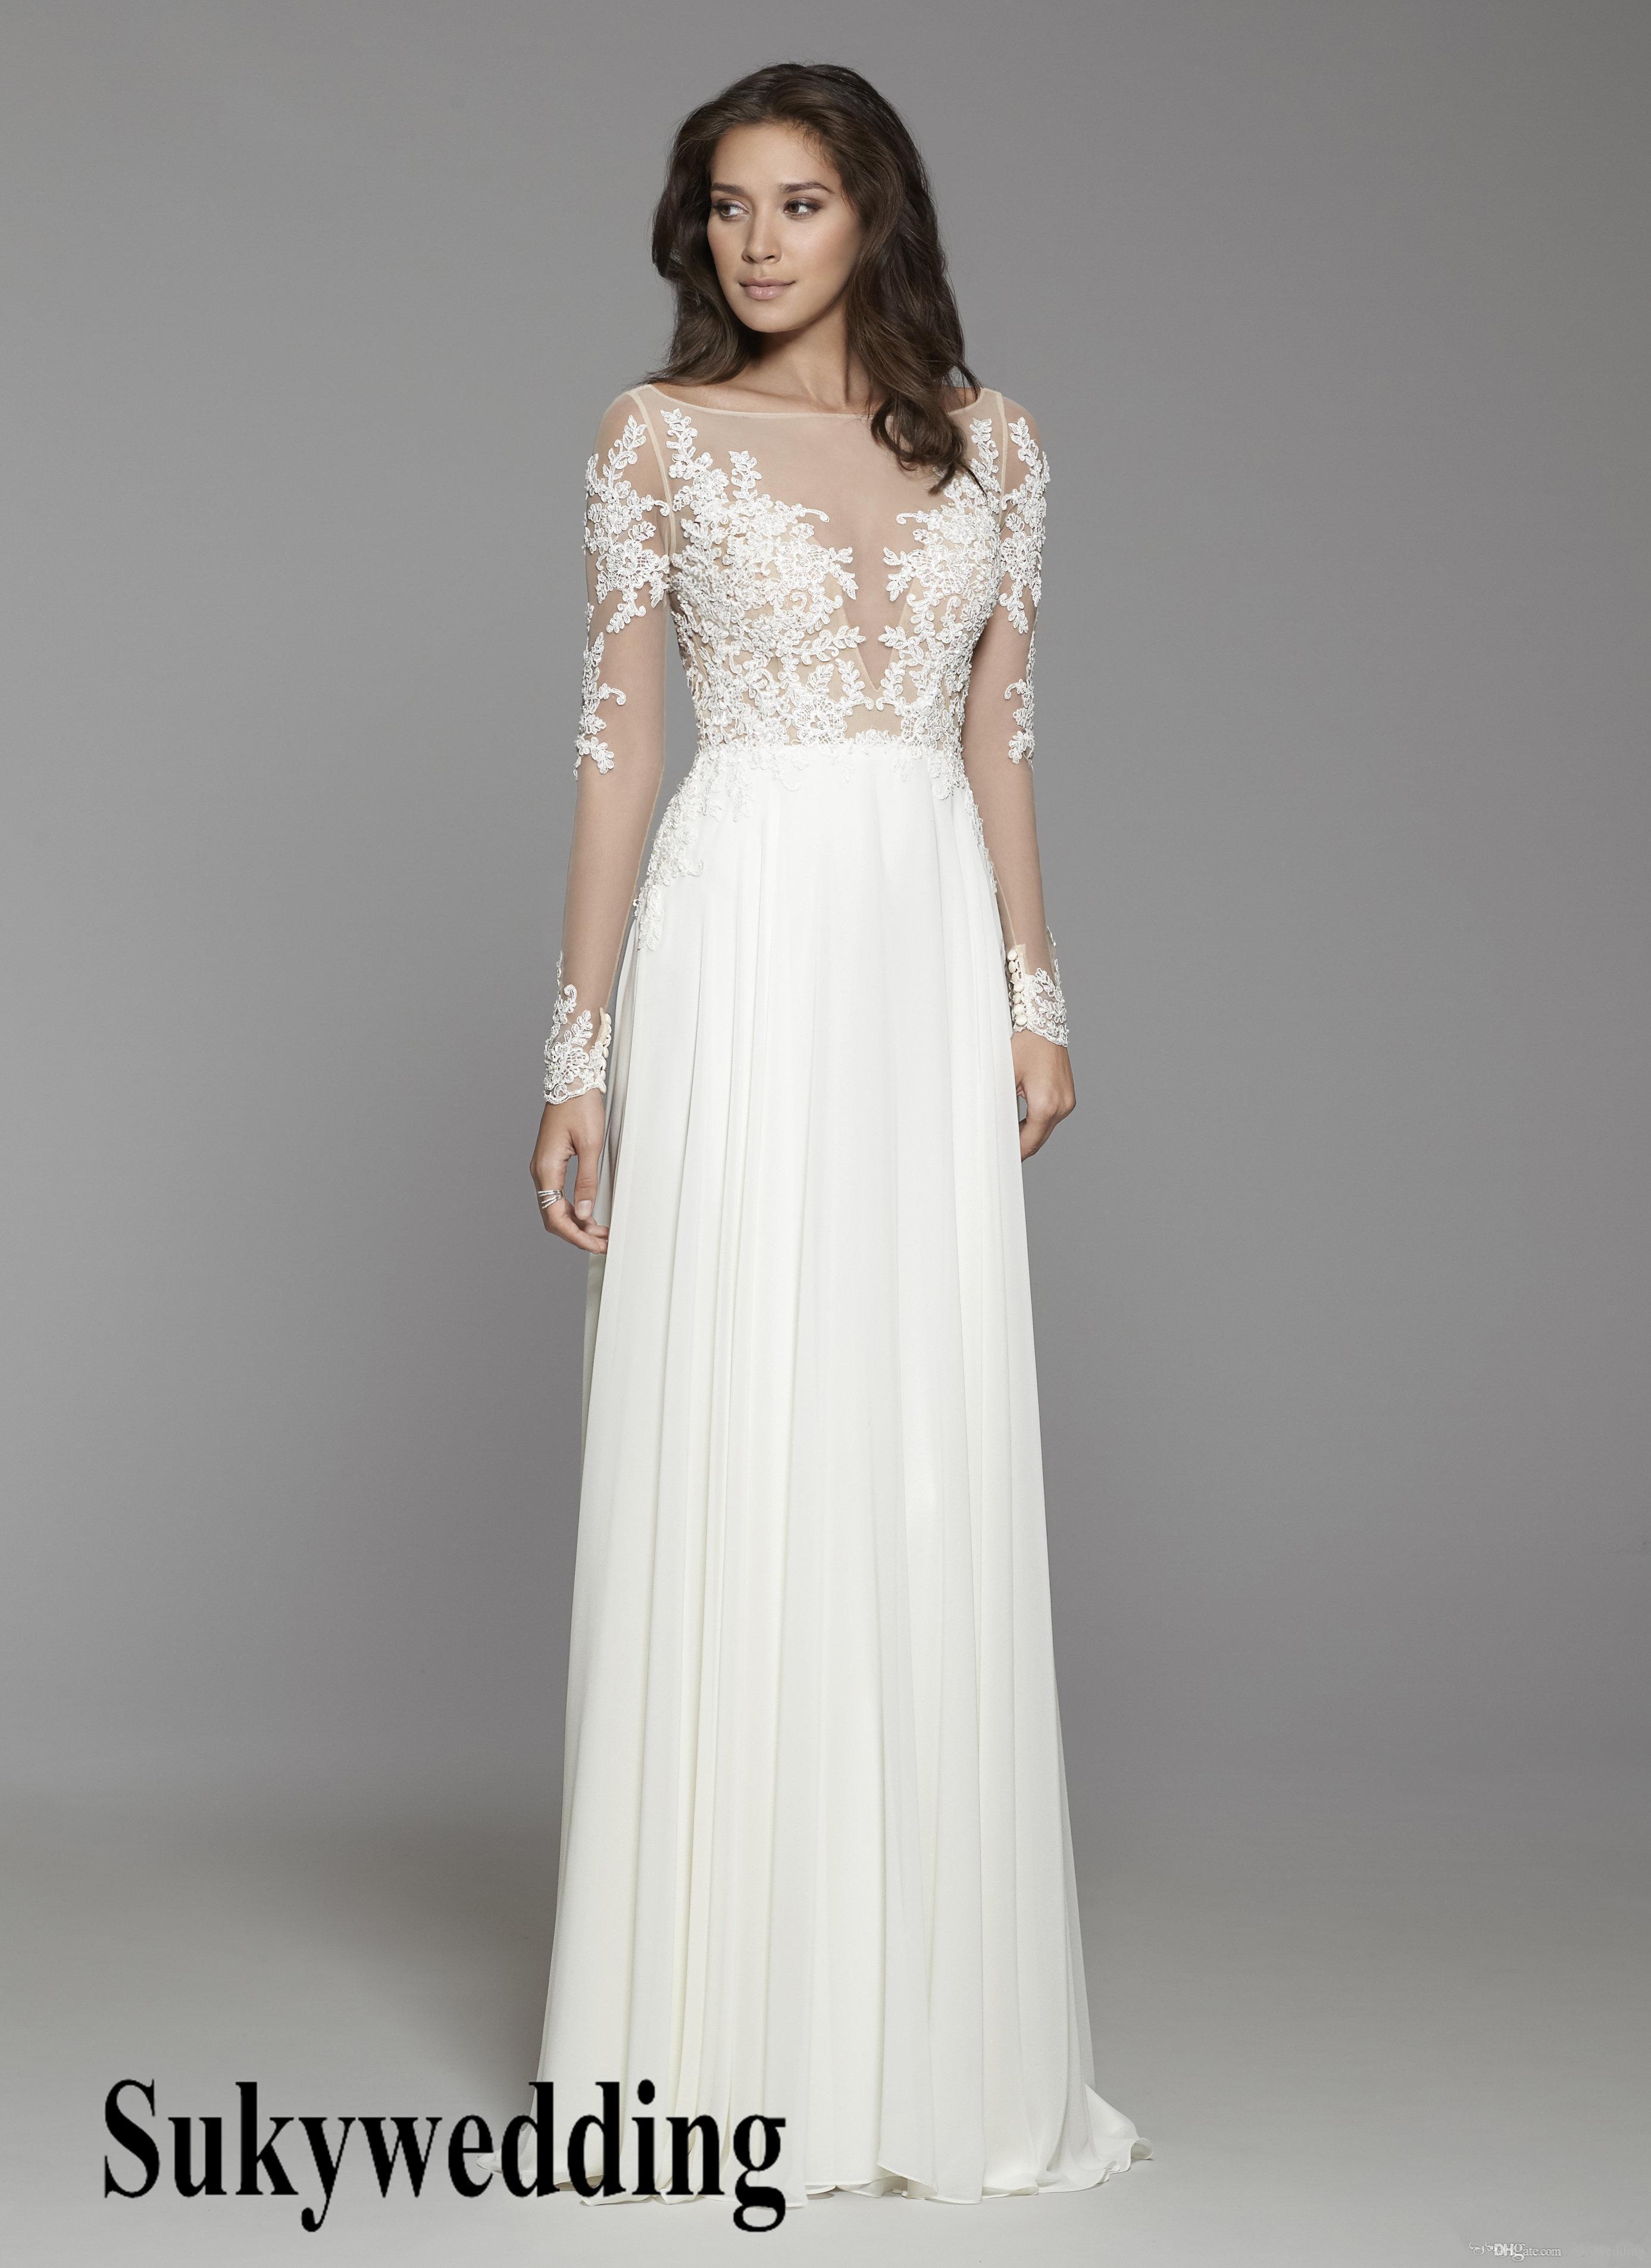 Discount 2019 Cheap A Line Bohemian Wedding Dresses Long Sleeve